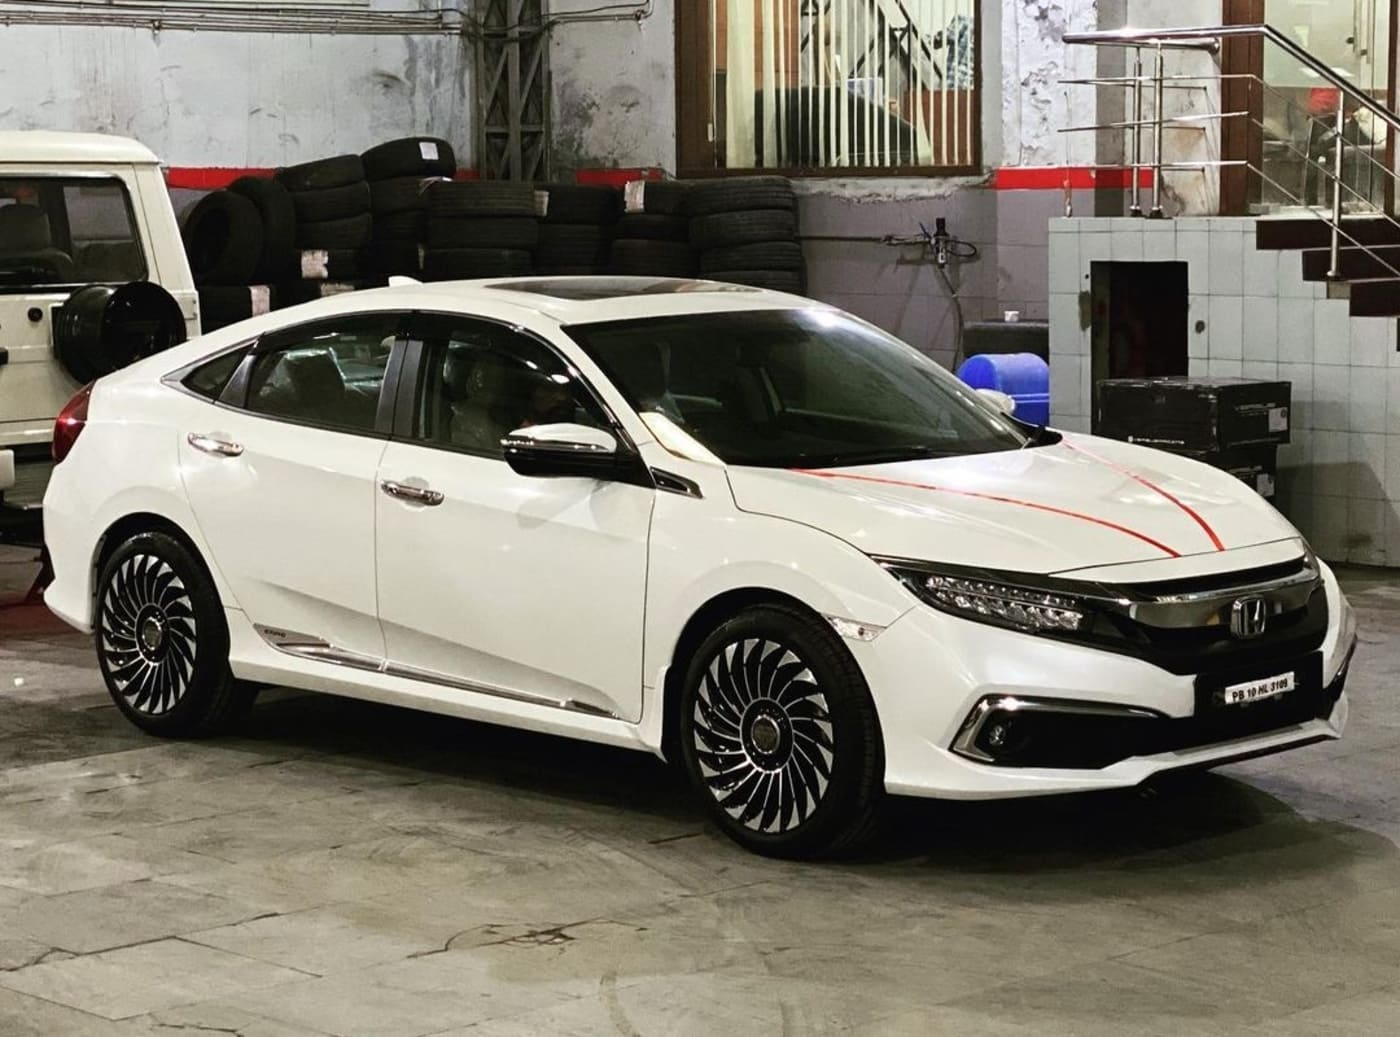 Honda Civic With Aftermarket 18 Inch Wheels Looks Elegant